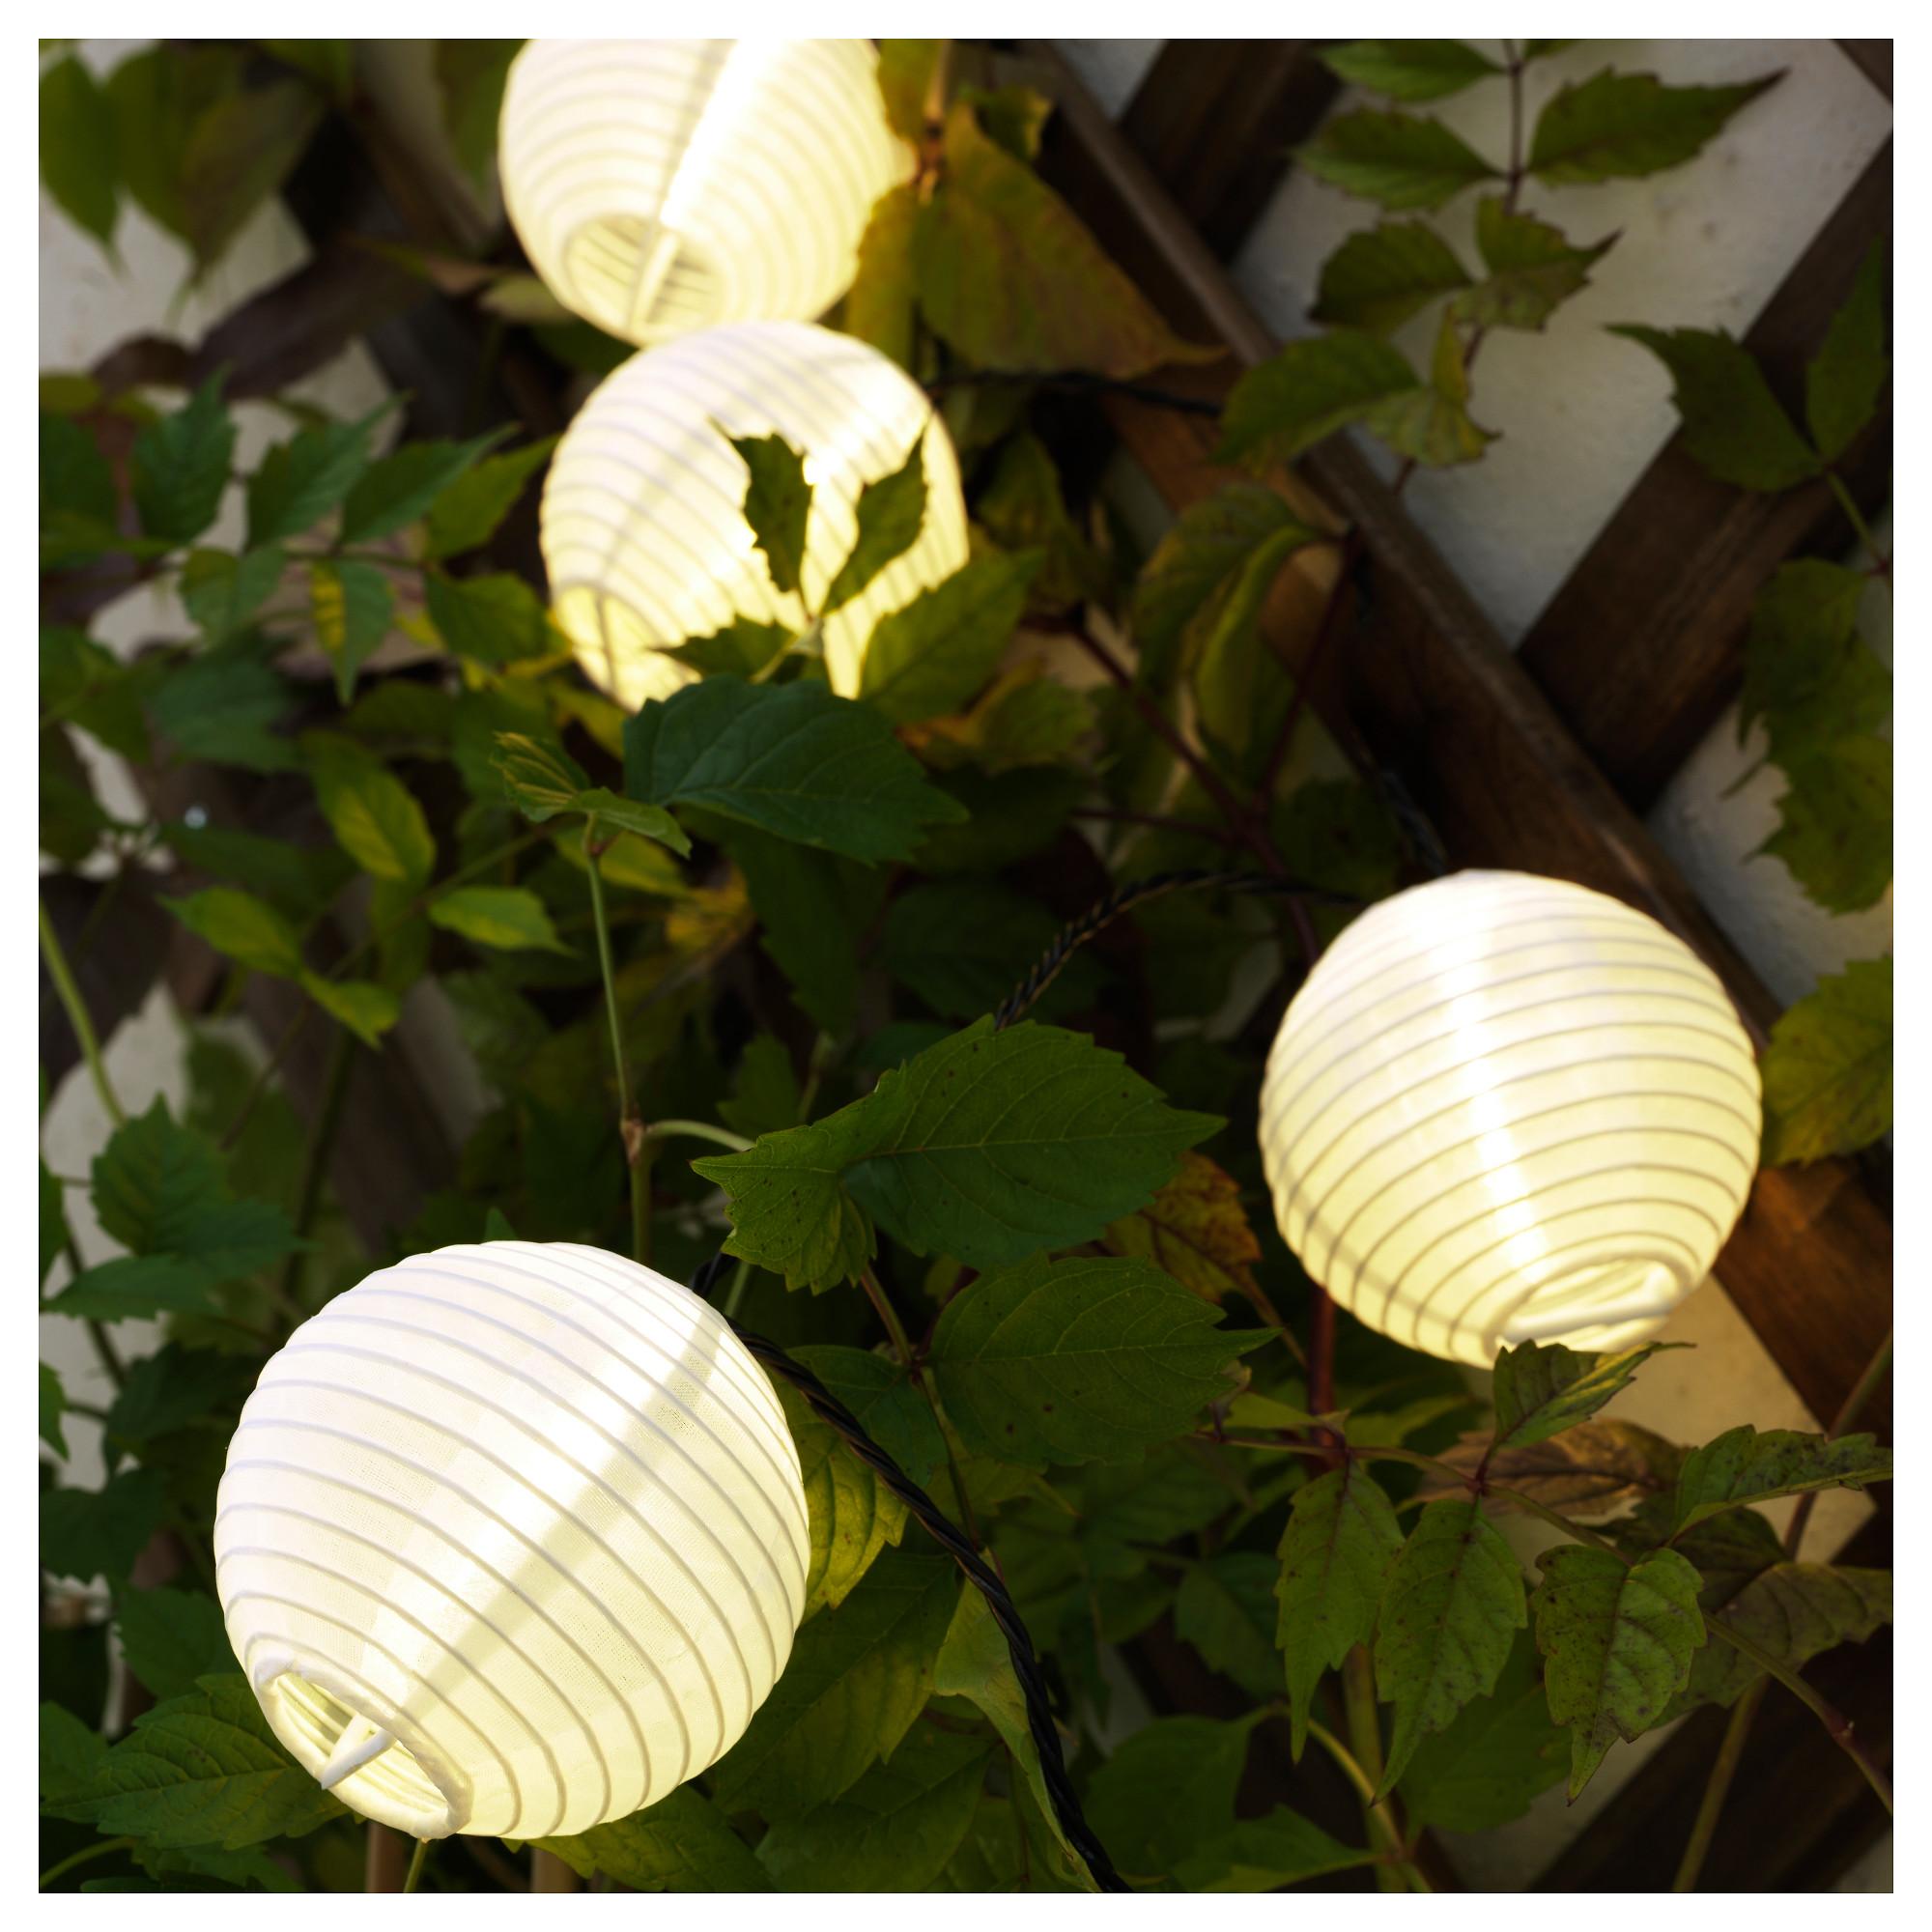 SOLVINDEN Decoration for fairy lights - IKEA